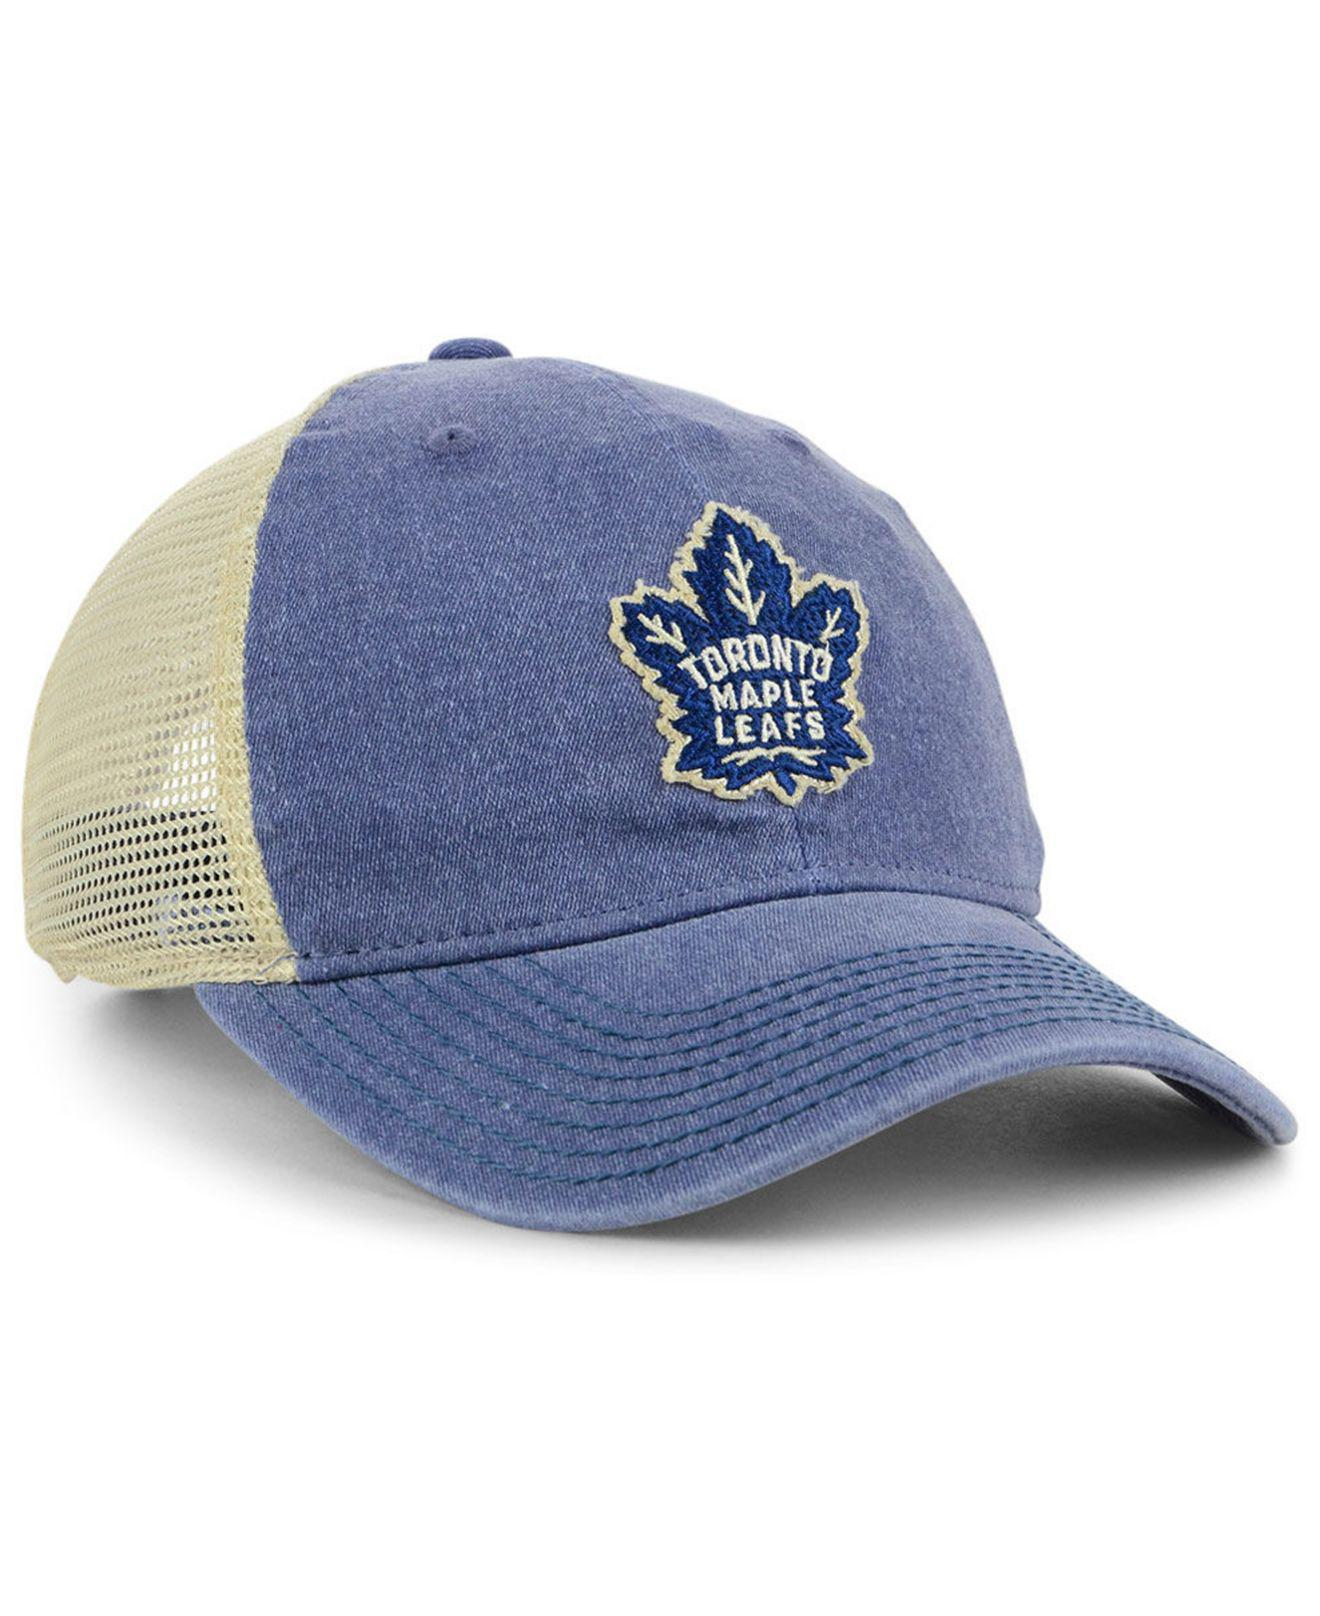 best service 463e4 fef1e ... inexpensive adidas blue toronto maple leafs sun bleached slouch cap for men  lyst. view fullscreen